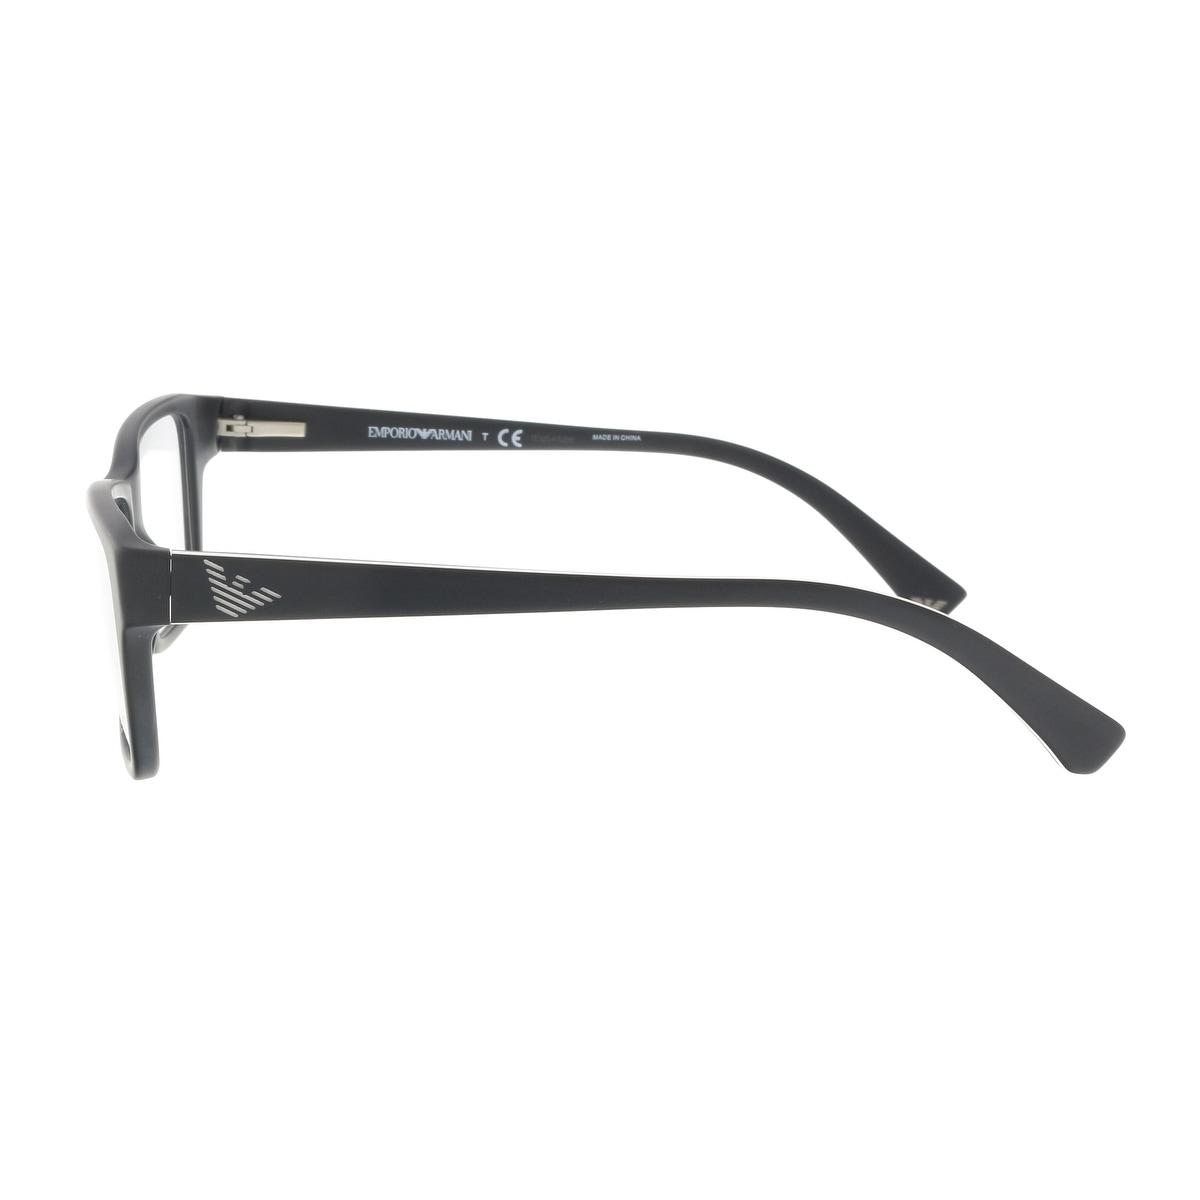 9bcaf99f9115 Shop Emporio Armani EA3057 5364 54 Matte Black Square Optical Frames - 54-17-140  - Free Shipping Today - Overstock - 19210662